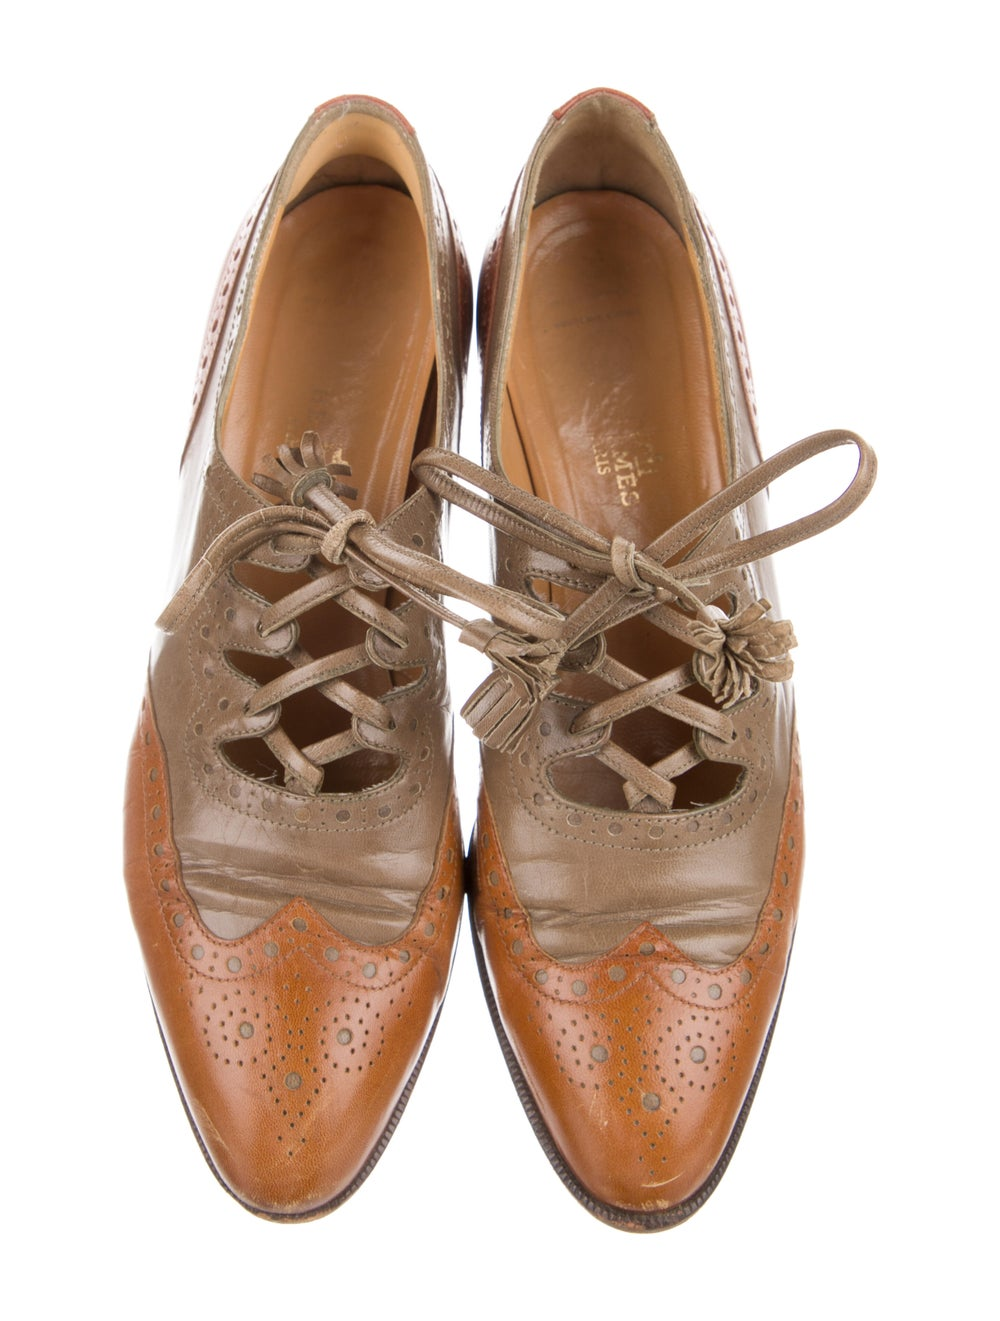 Hermès Vintage Leather Oxfords Brown - image 3